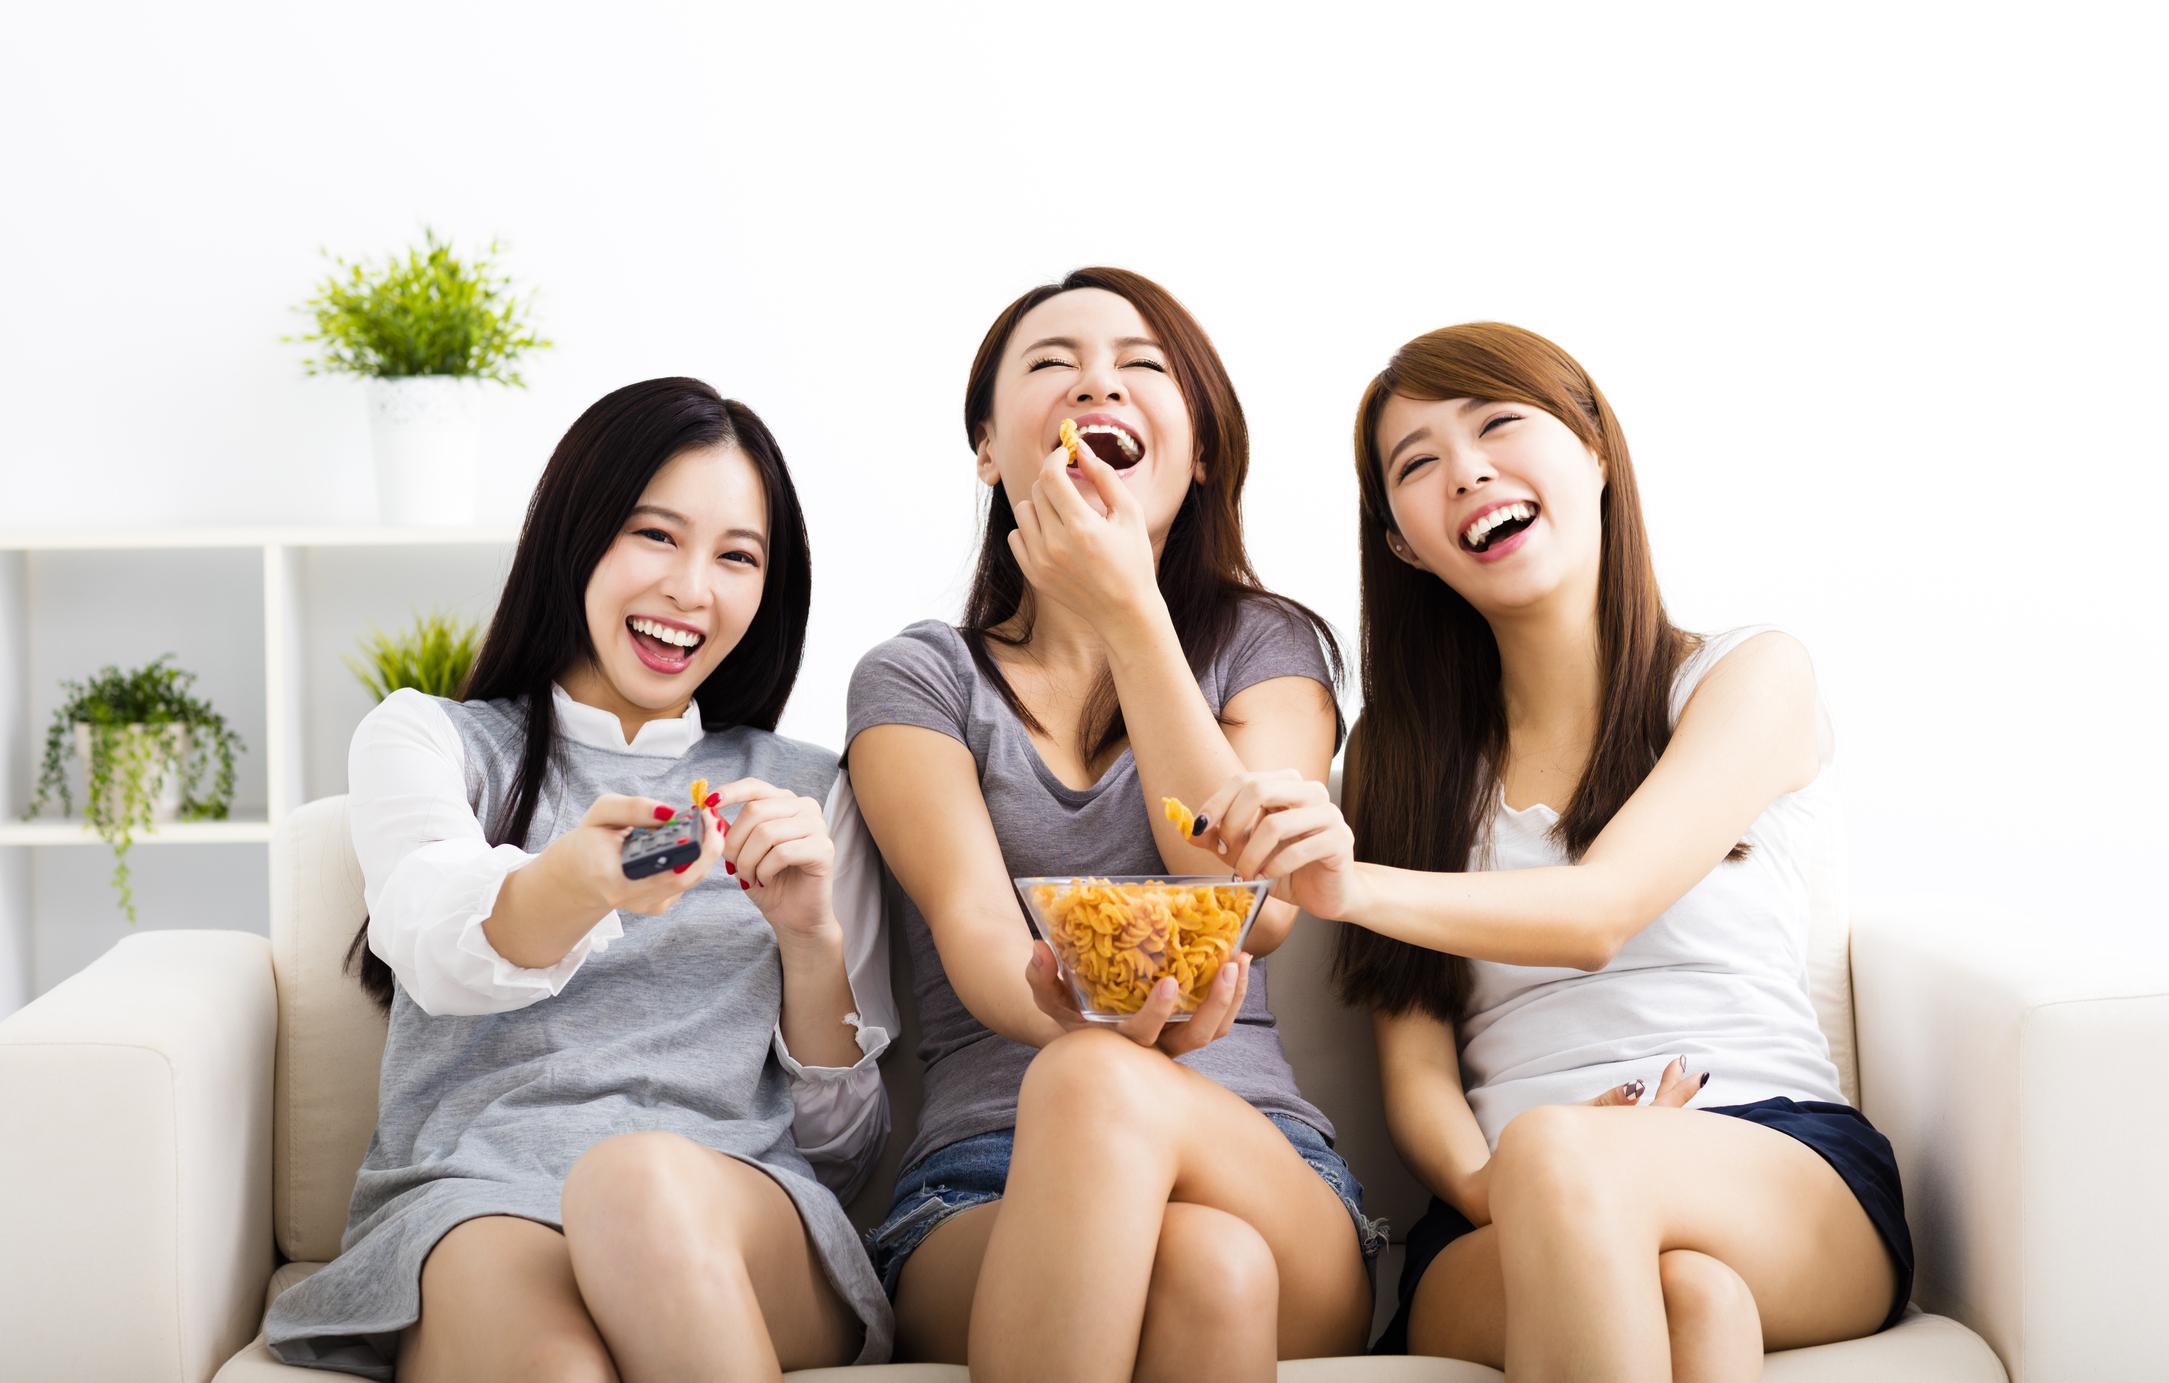 Three young women watch TV.